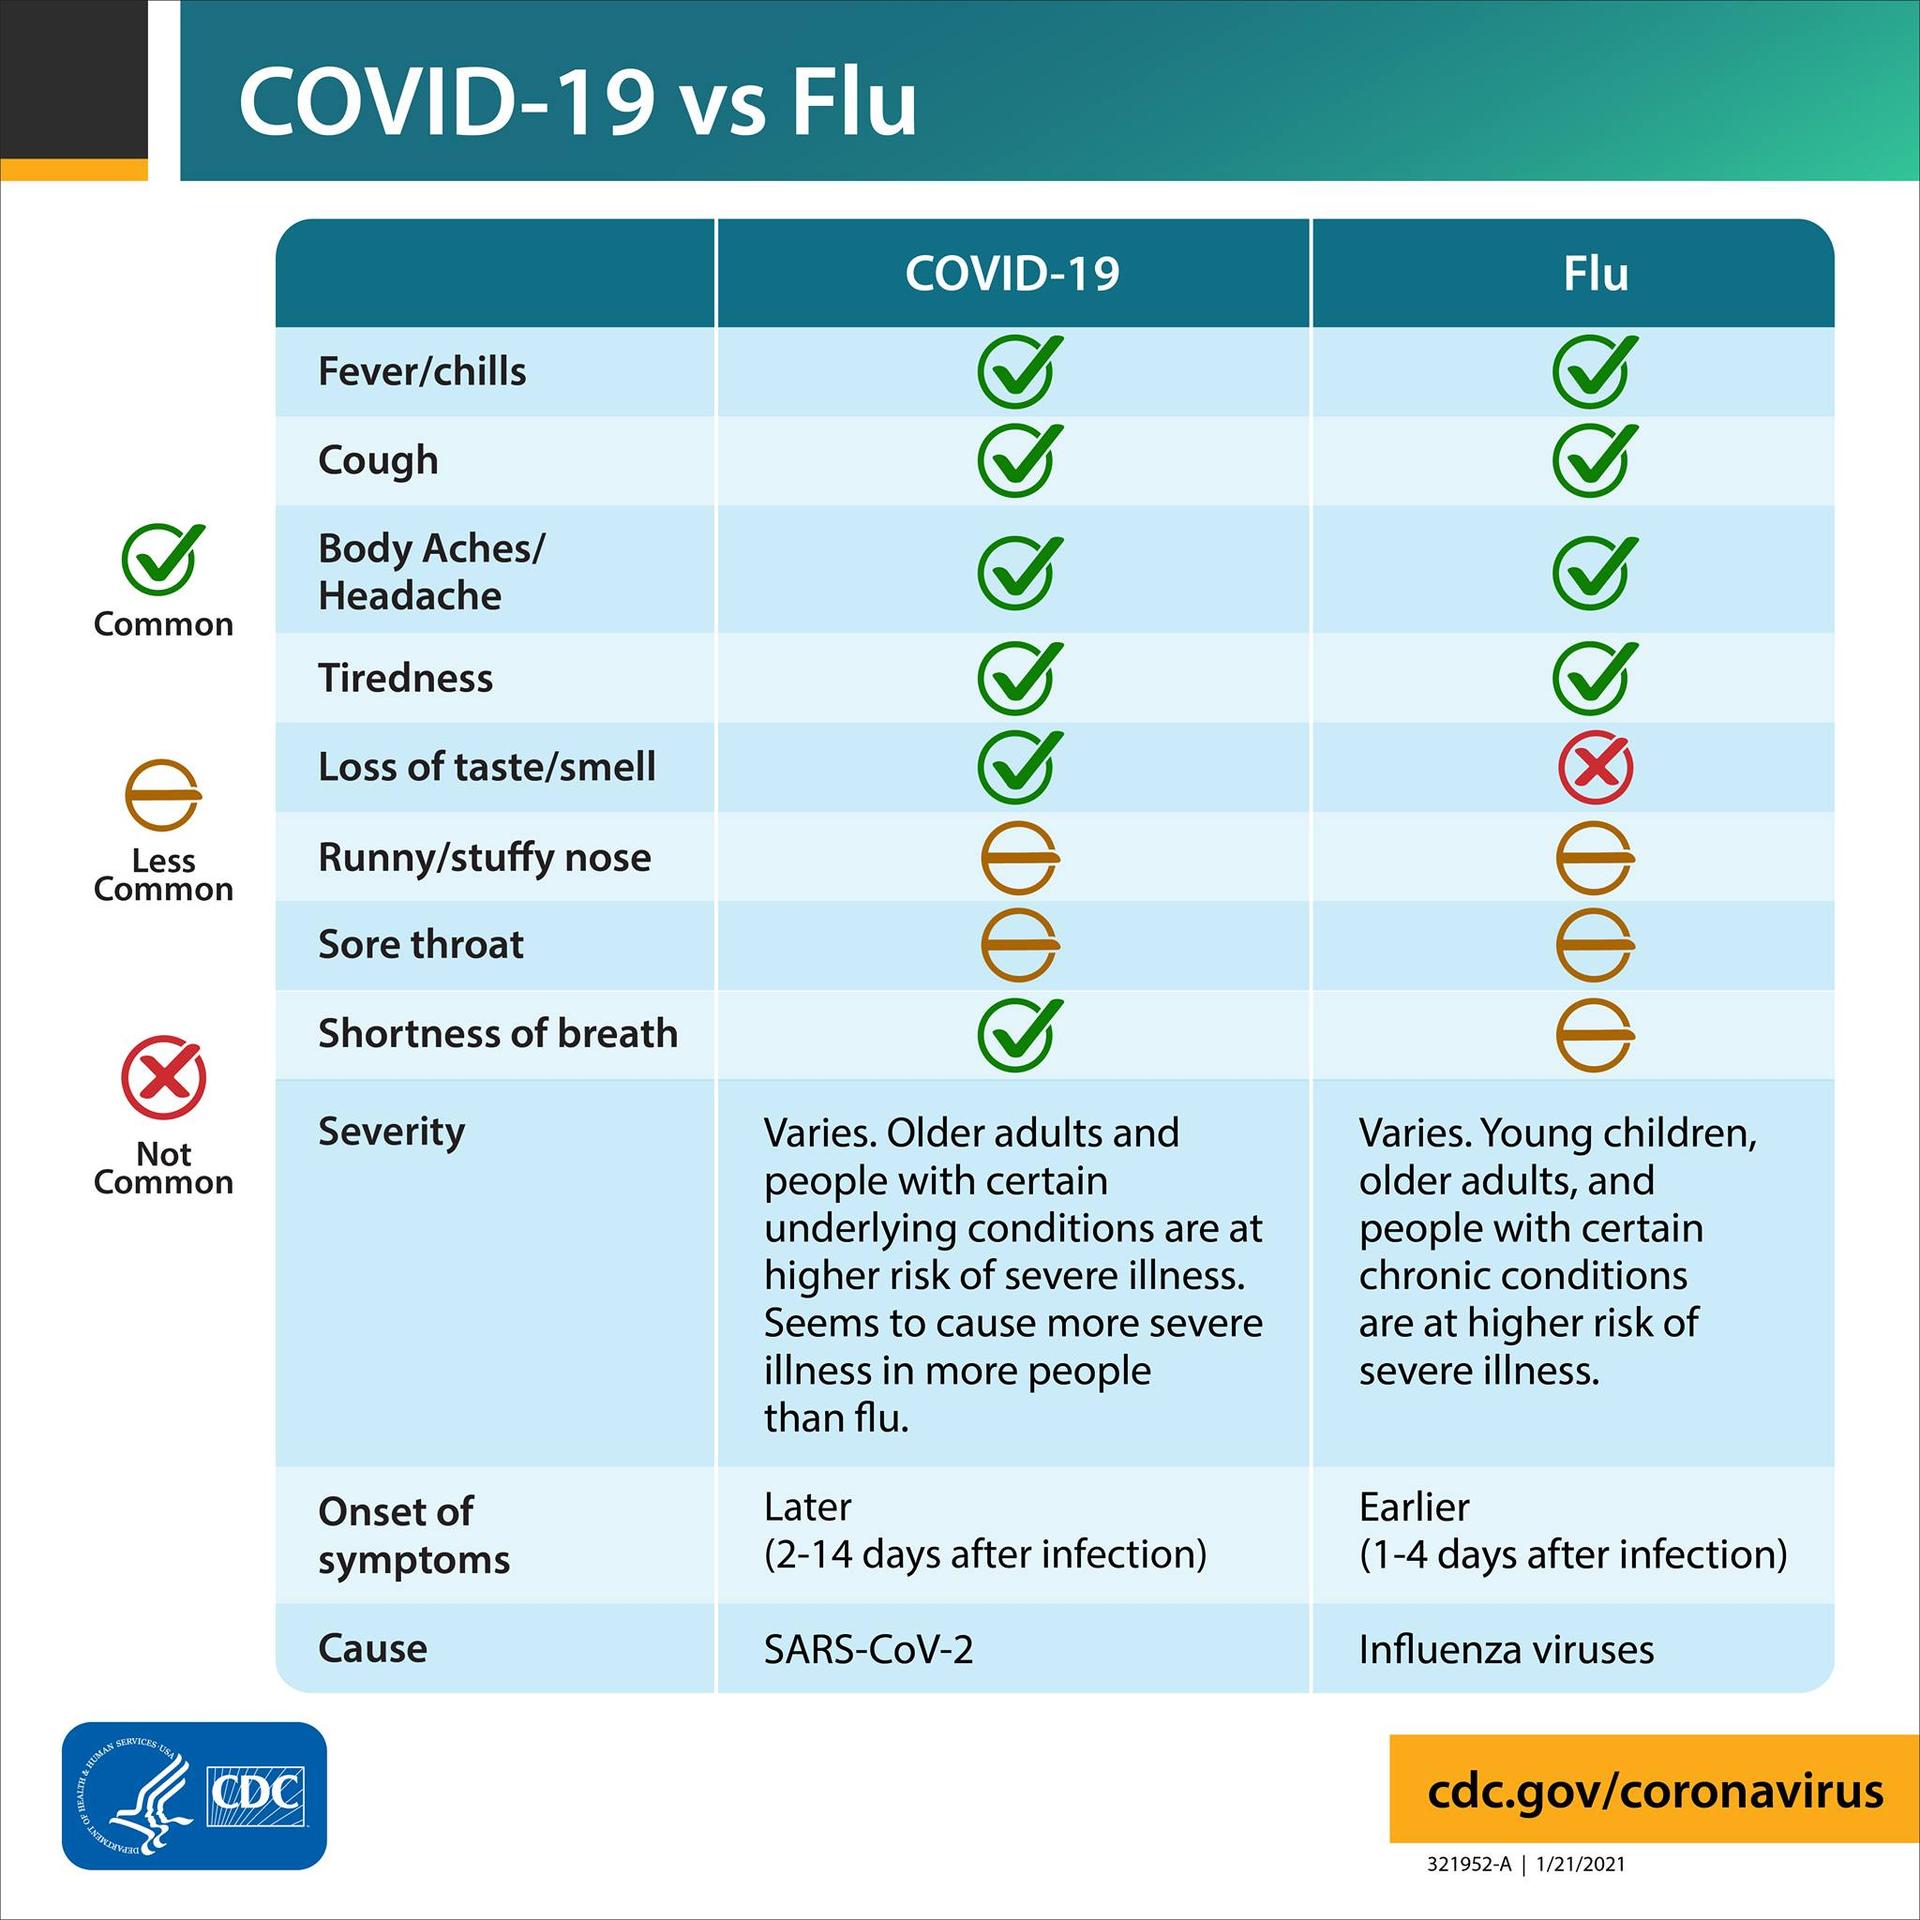 Covid 19 and Flu